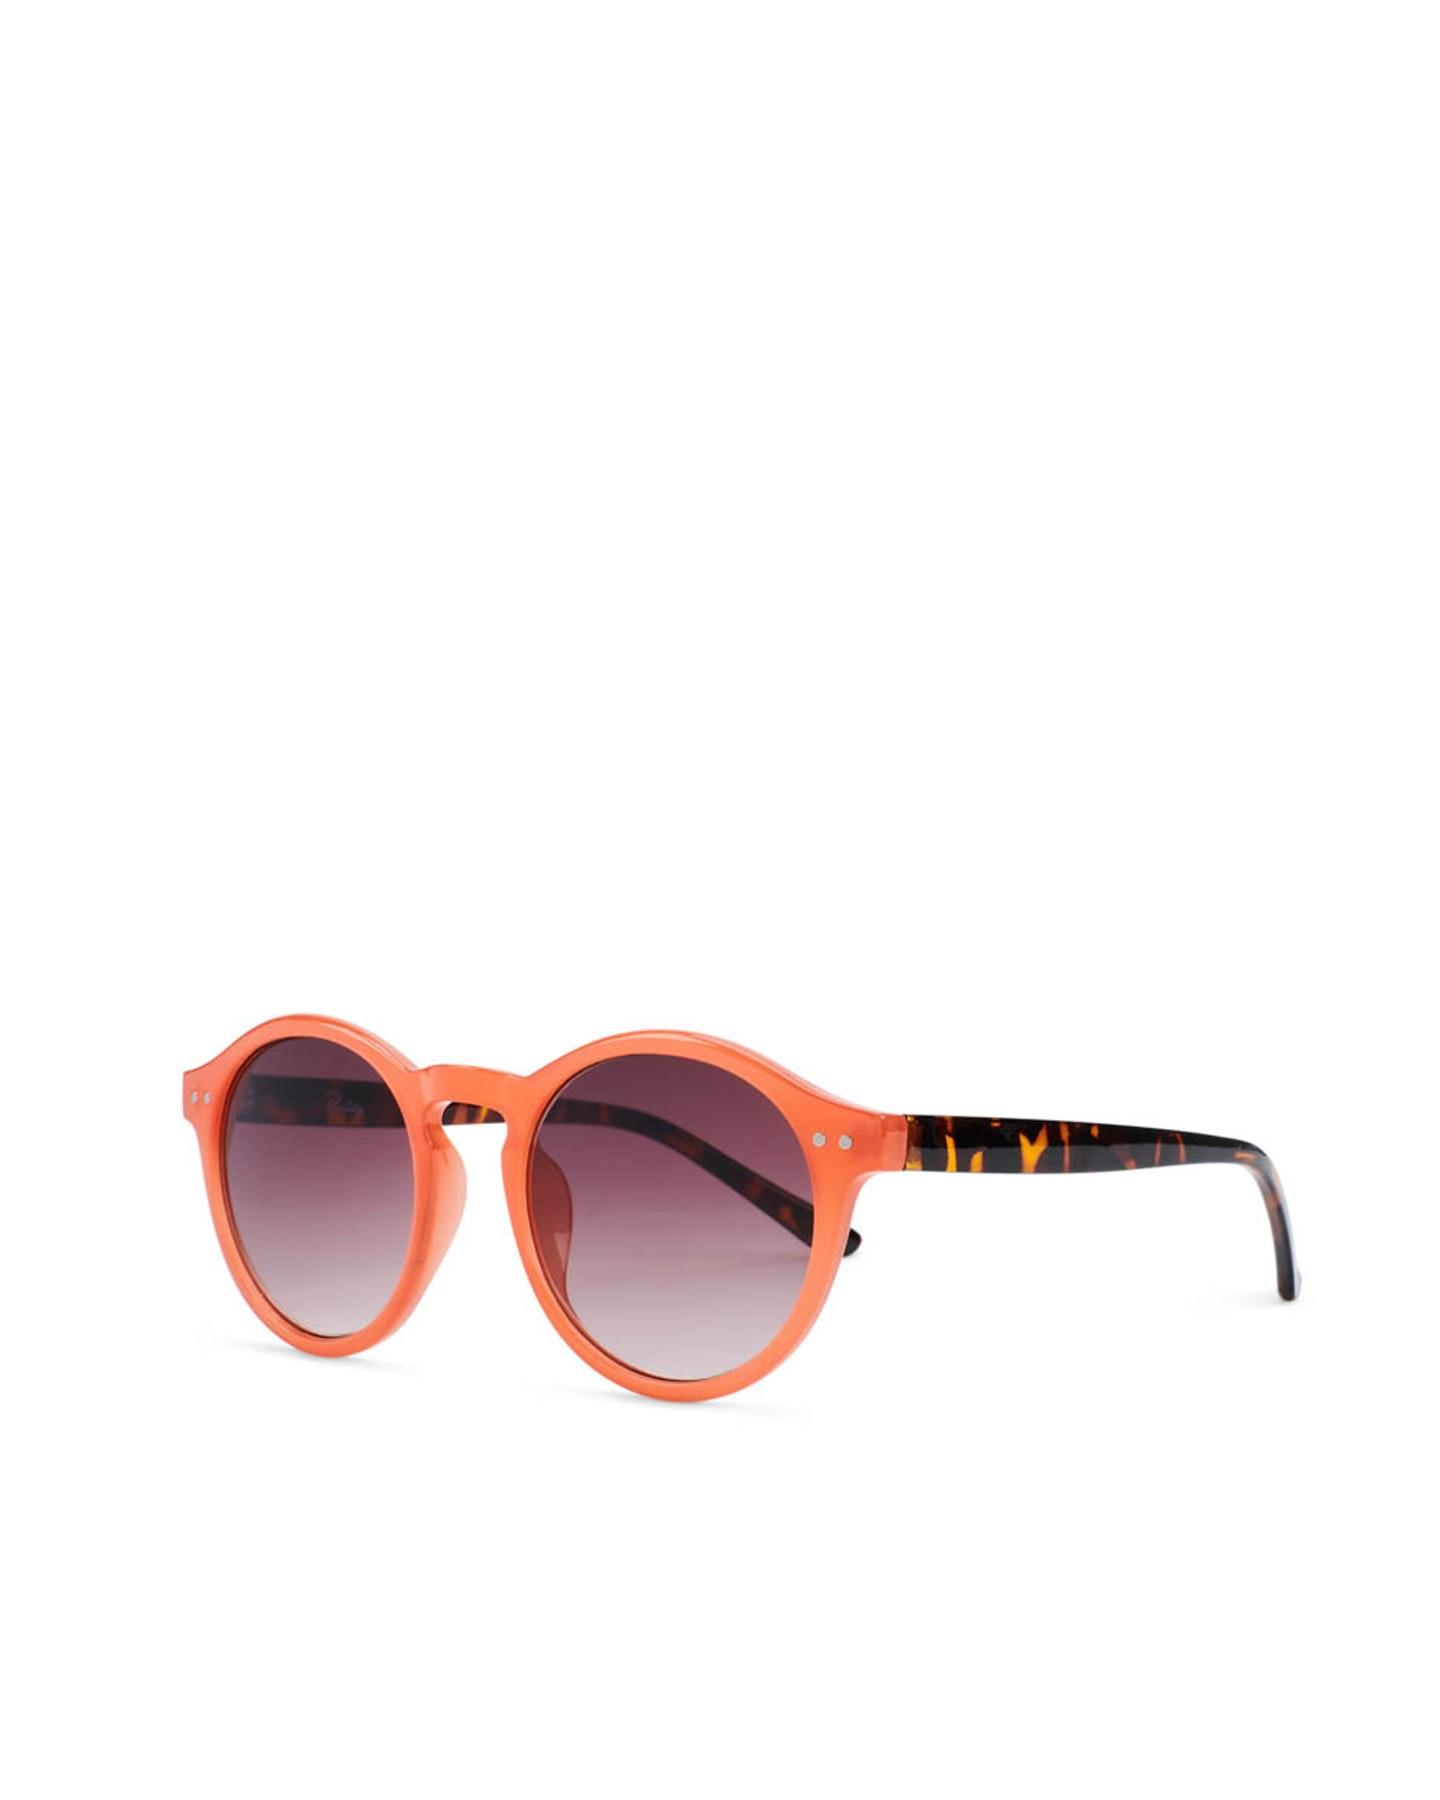 Reality Eyewear Hudson Sunglasses Coral Coral